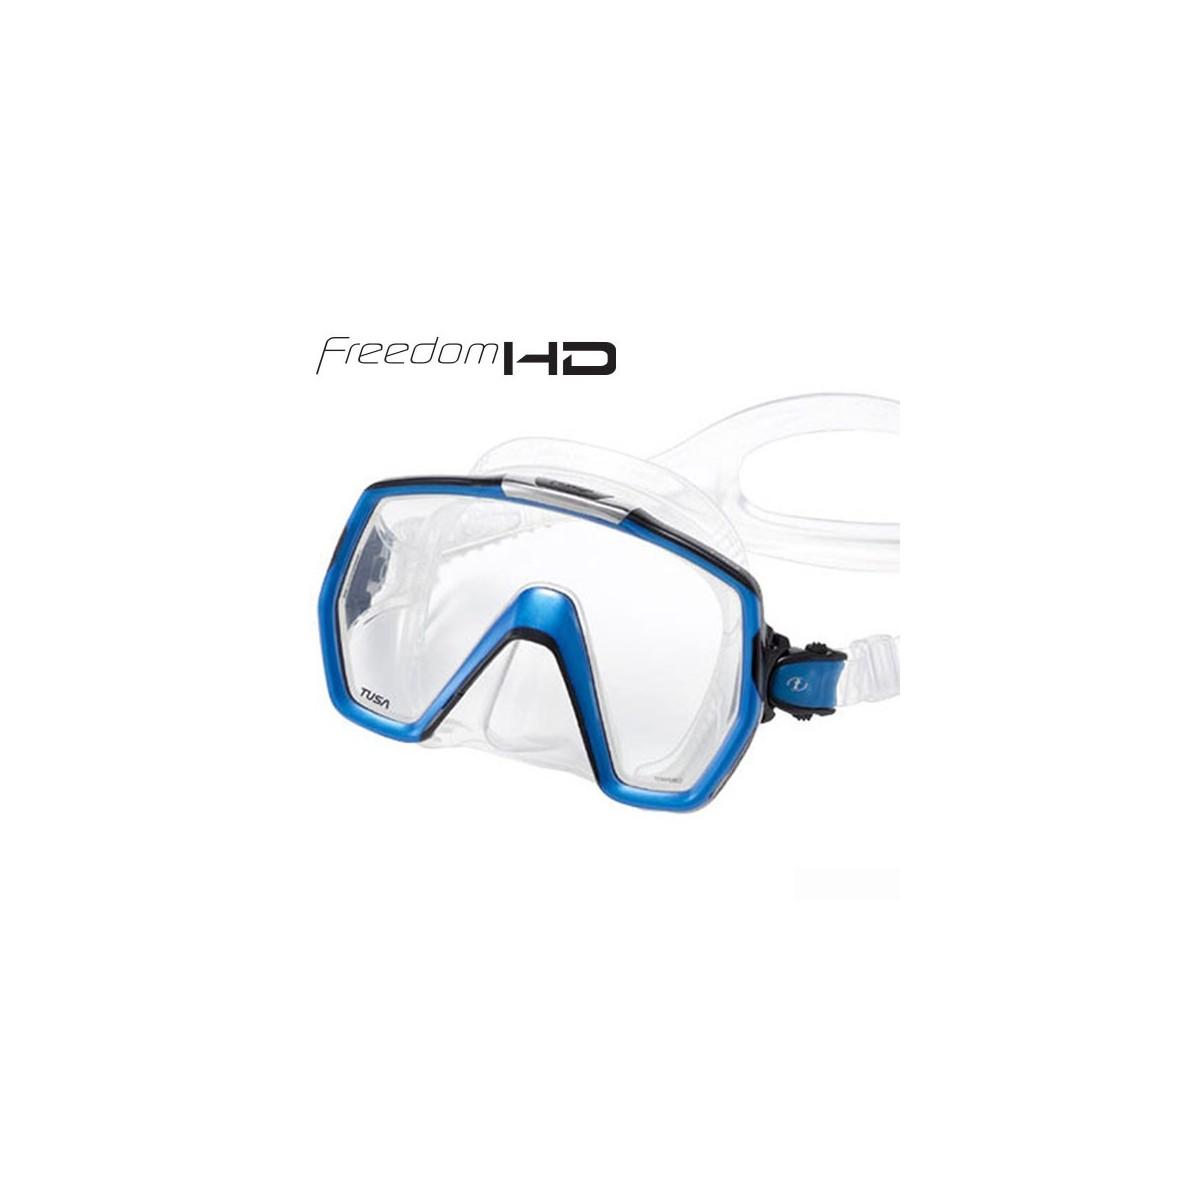 TUSA M-1001 Freedom HD mask